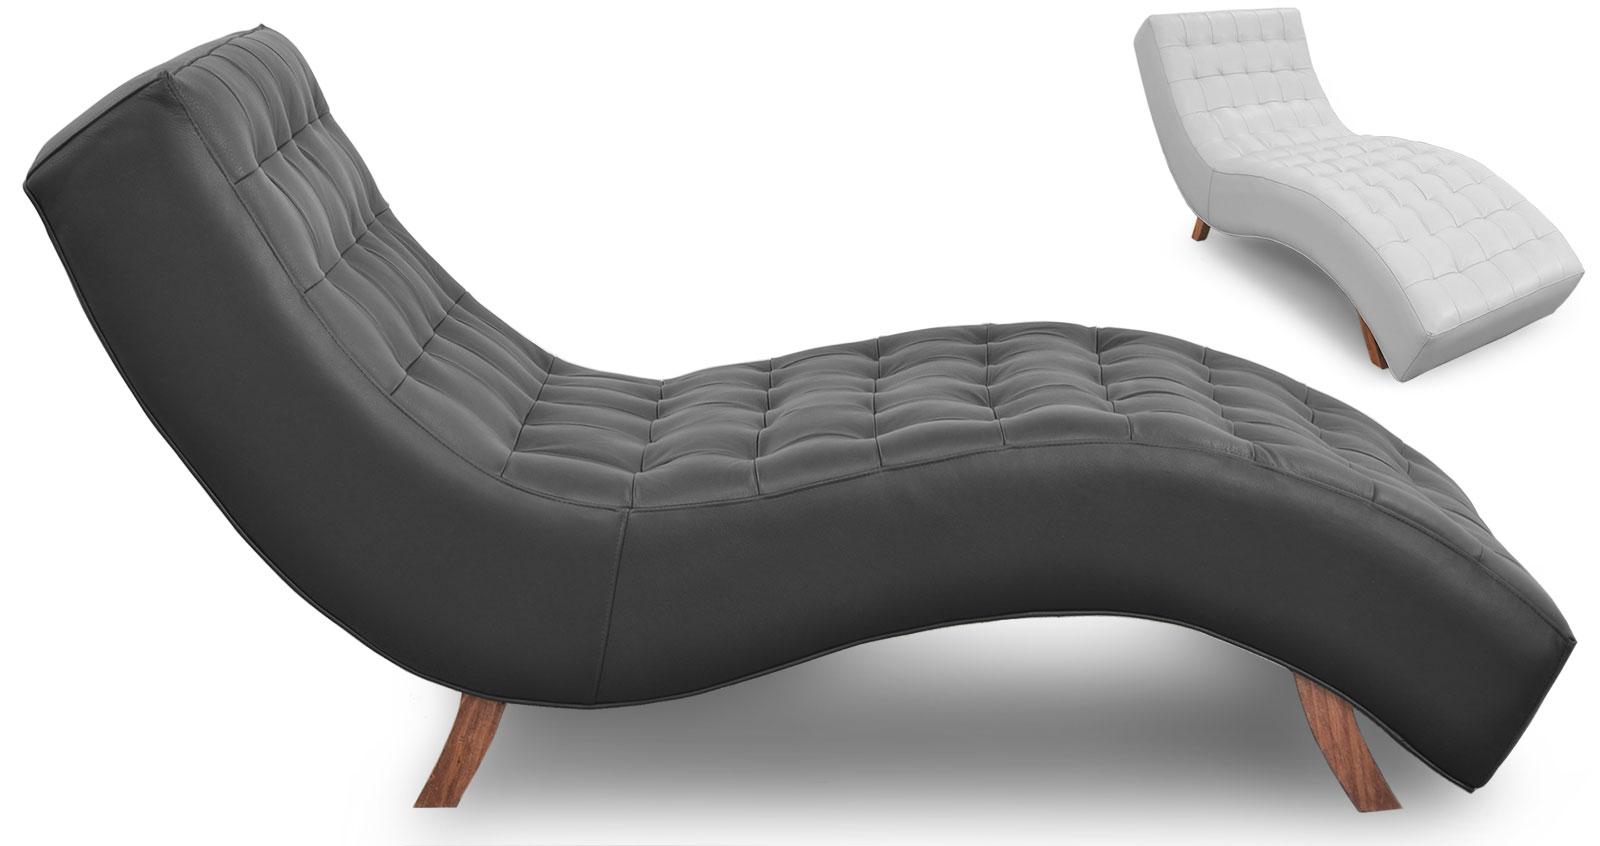 Italia chaise lounge the leather sofa company for Chaise lounge company